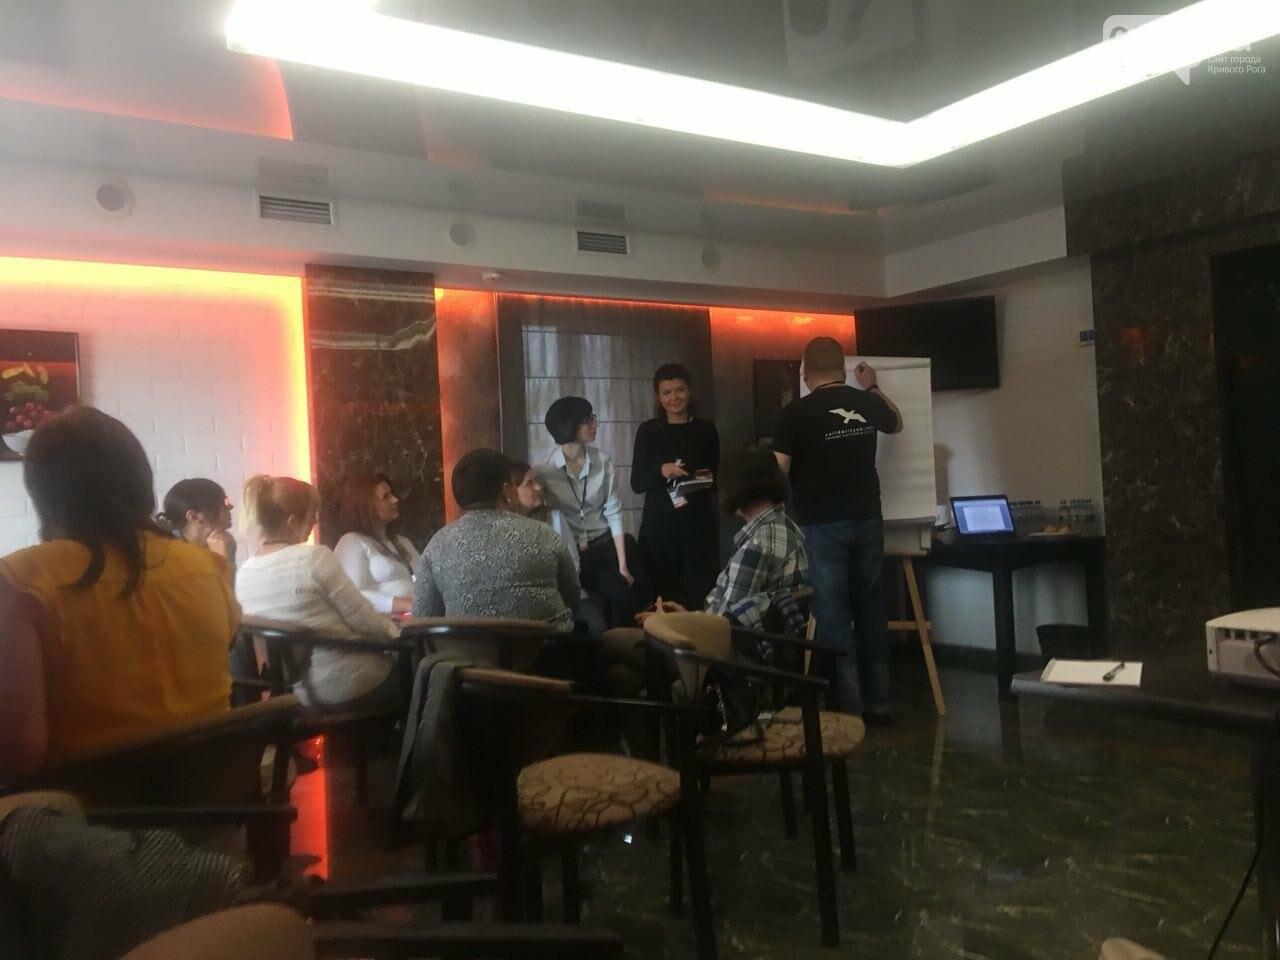 На тренинге о ВИЧ и медреформе криворожским журналистам рассказали о дискриминации и стереотипах, - ФОТО , фото-9